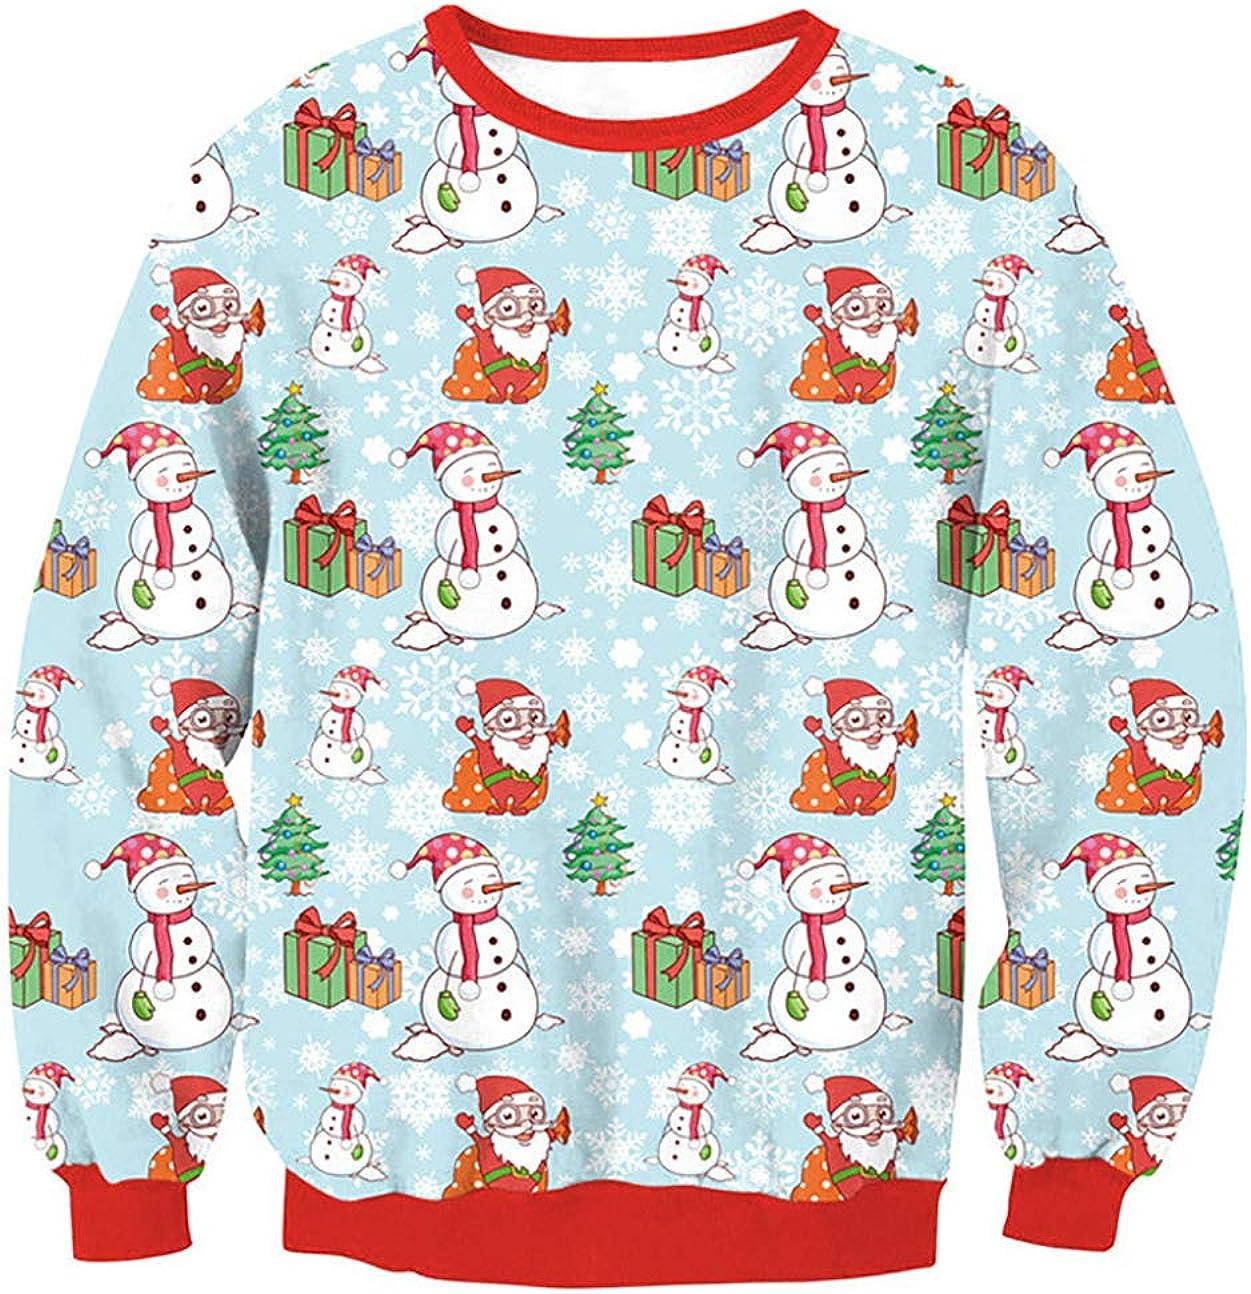 Men Cartoon Long Sleeve Snowman Snowflake Santa Graphic Tops Soft Tee Sweatshirt